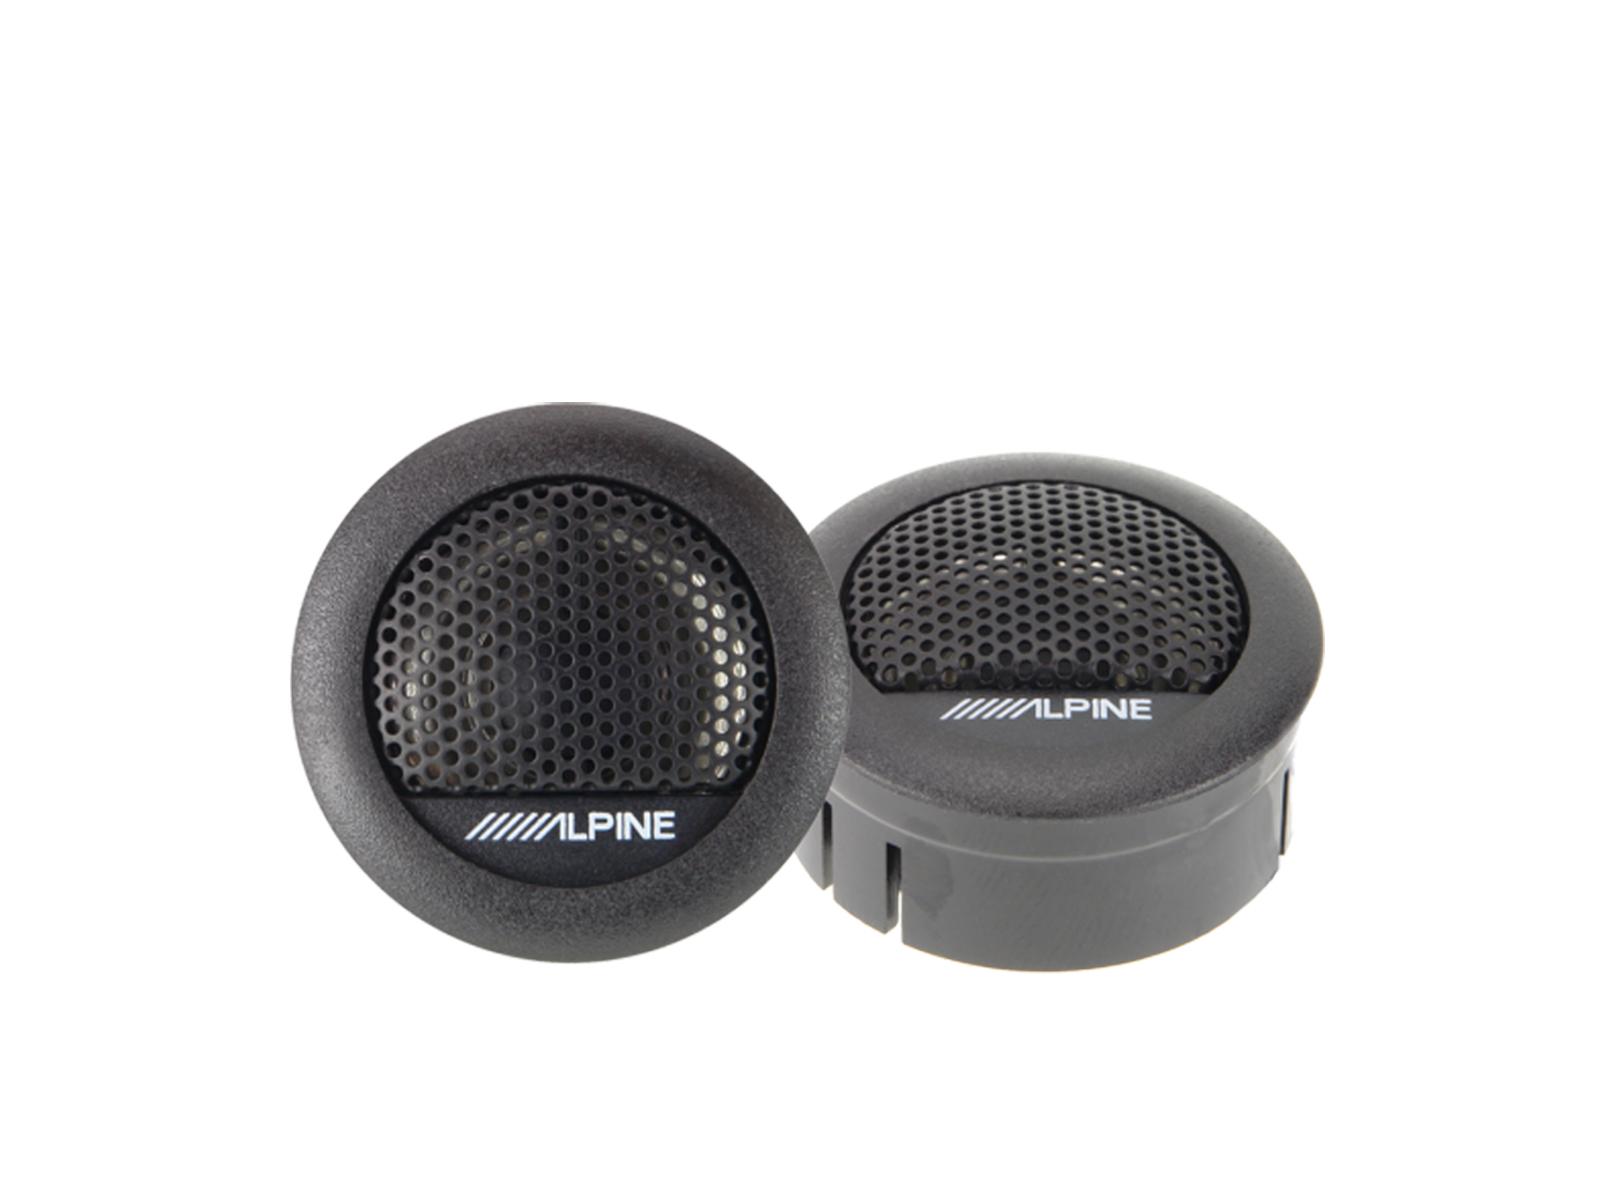 Mylar-Titanium Balanced Dome Tweeter 3 cm - Alpine - SXE-1006TW